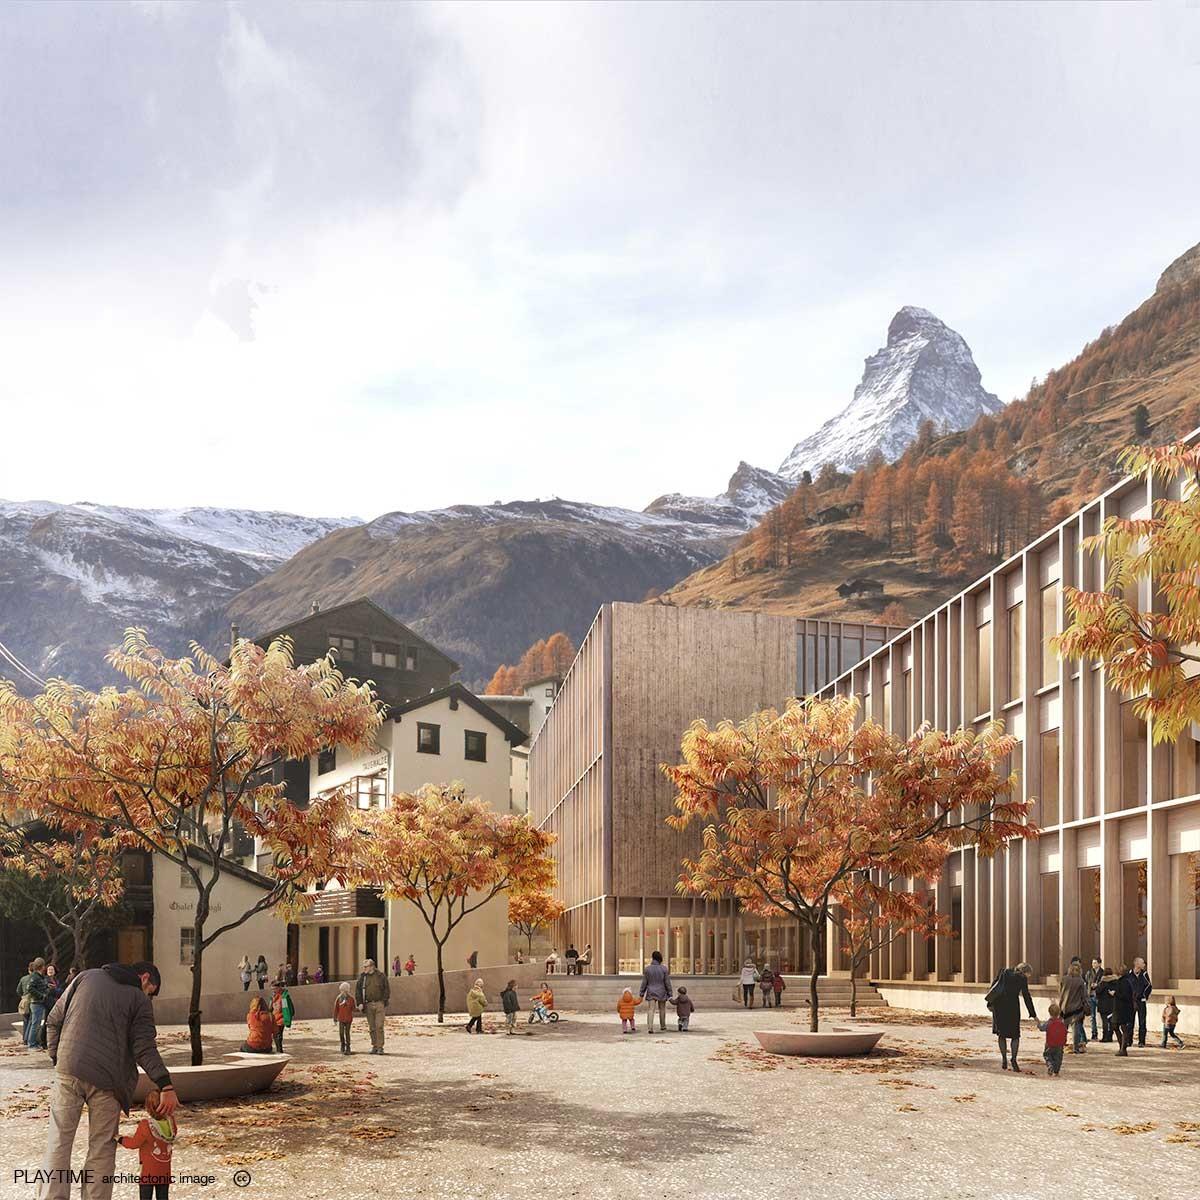 Play time architectonic image gwj architektur zermatt school 1st prize 01